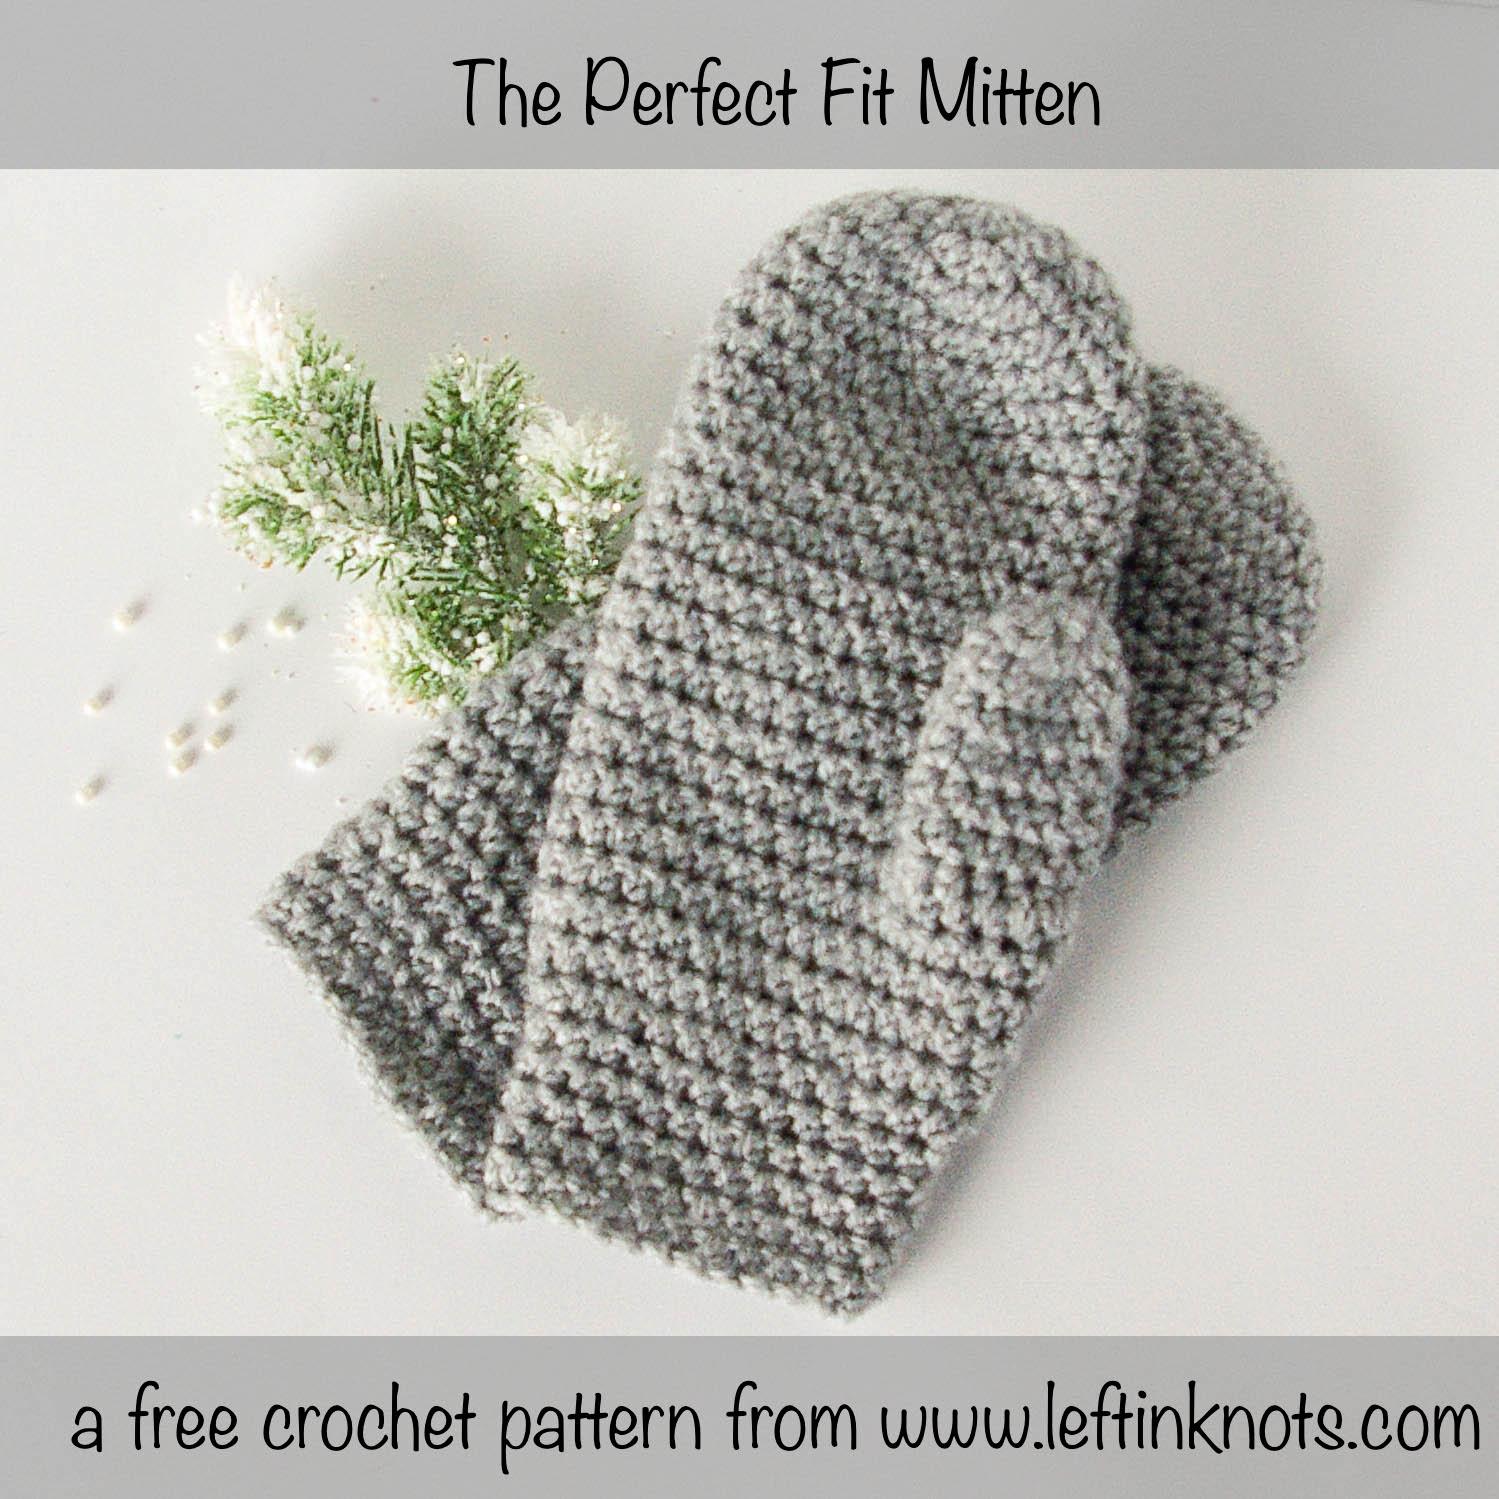 #M240 Holidays 1 New Mitt Will Match Crochet Towel #M231